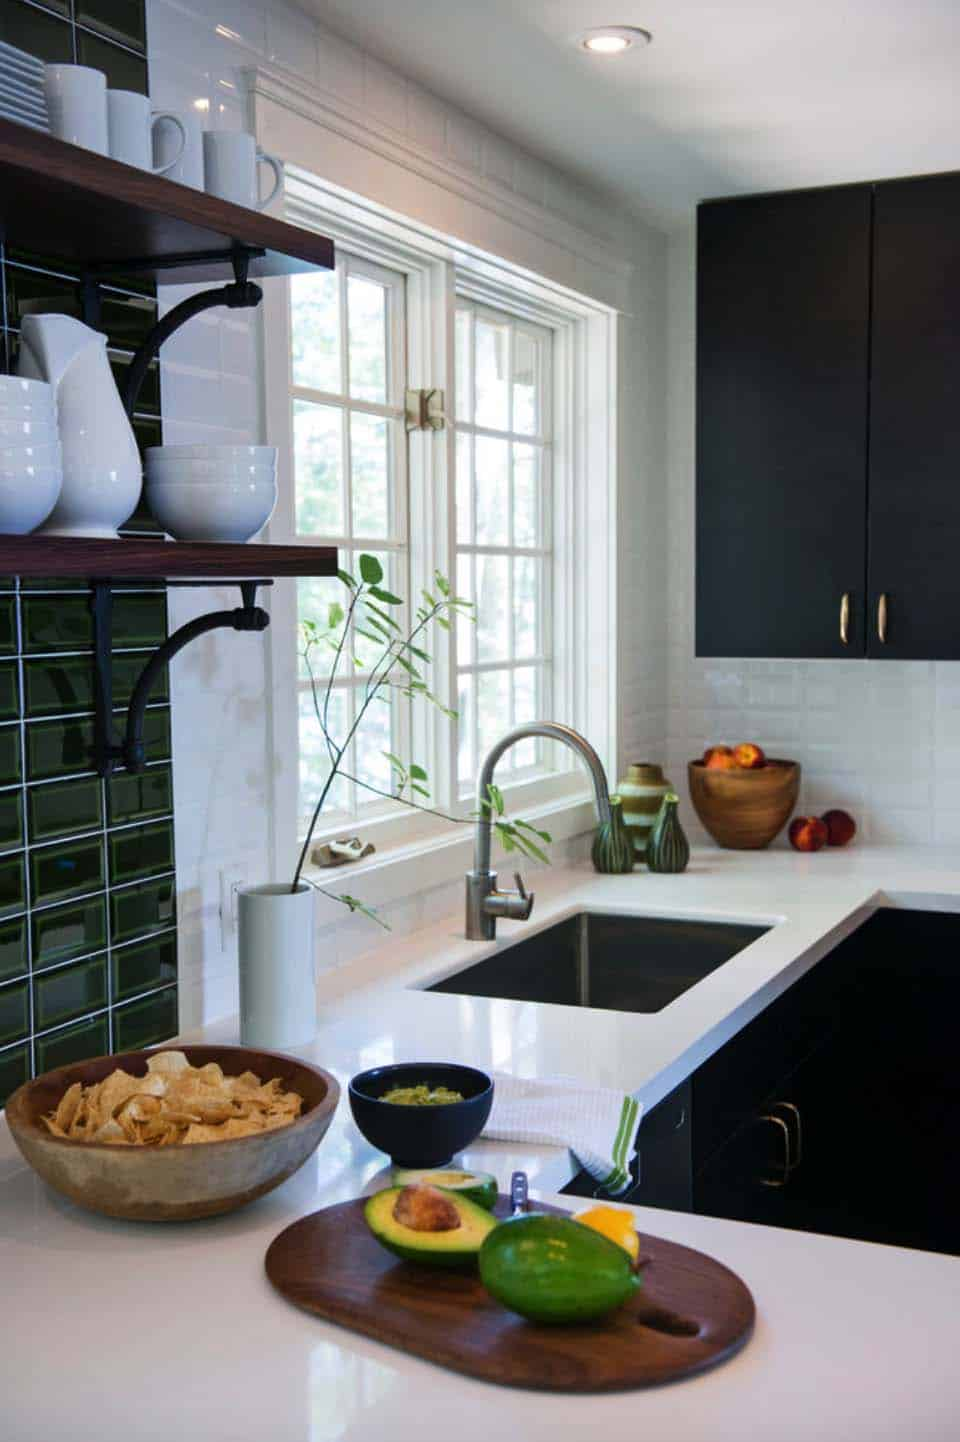 Cottage contemporain rustique-Timothy Johnson Design-02-1 Kindesign